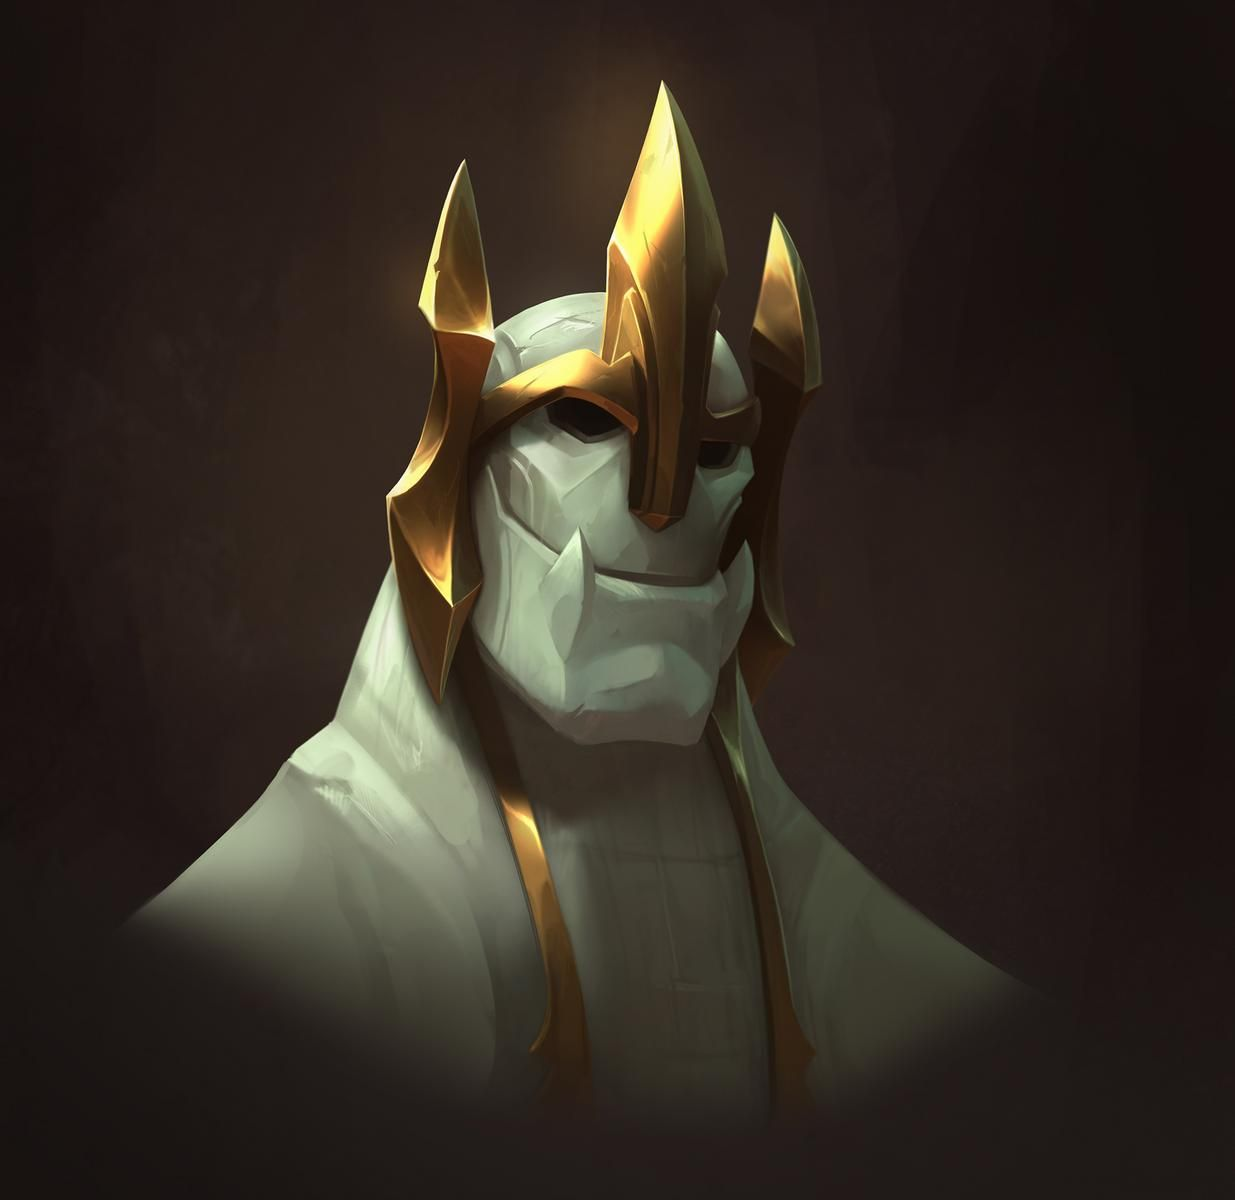 Galio Champions Universe Of League Of Legends Lol League Of Legends League Of Legends Characters League Of Legends